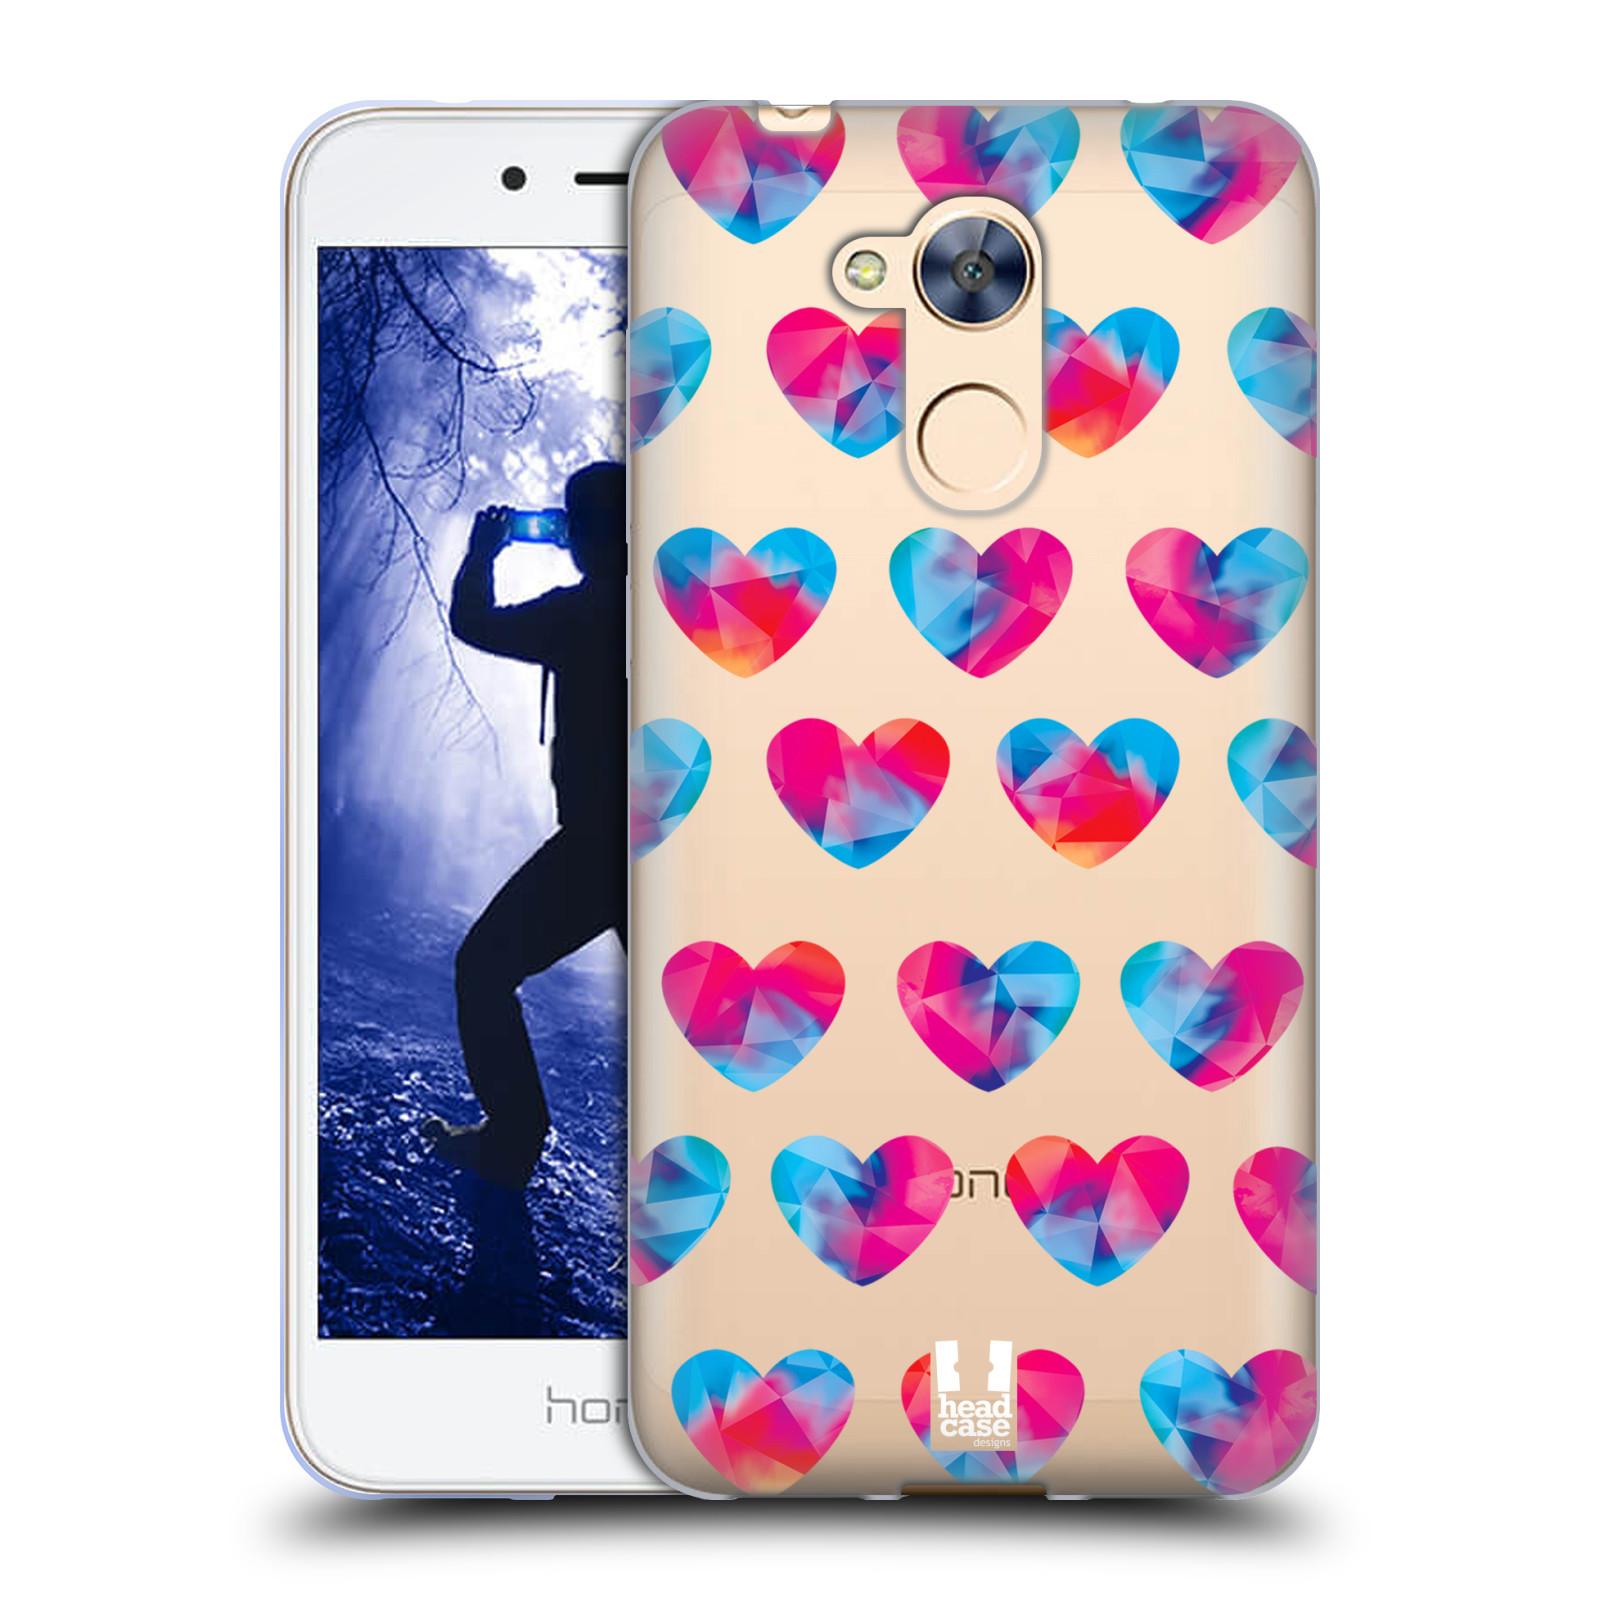 Silikonové pouzdro na mobil Honor 6A - Head Case - Srdíčka hrající barvami